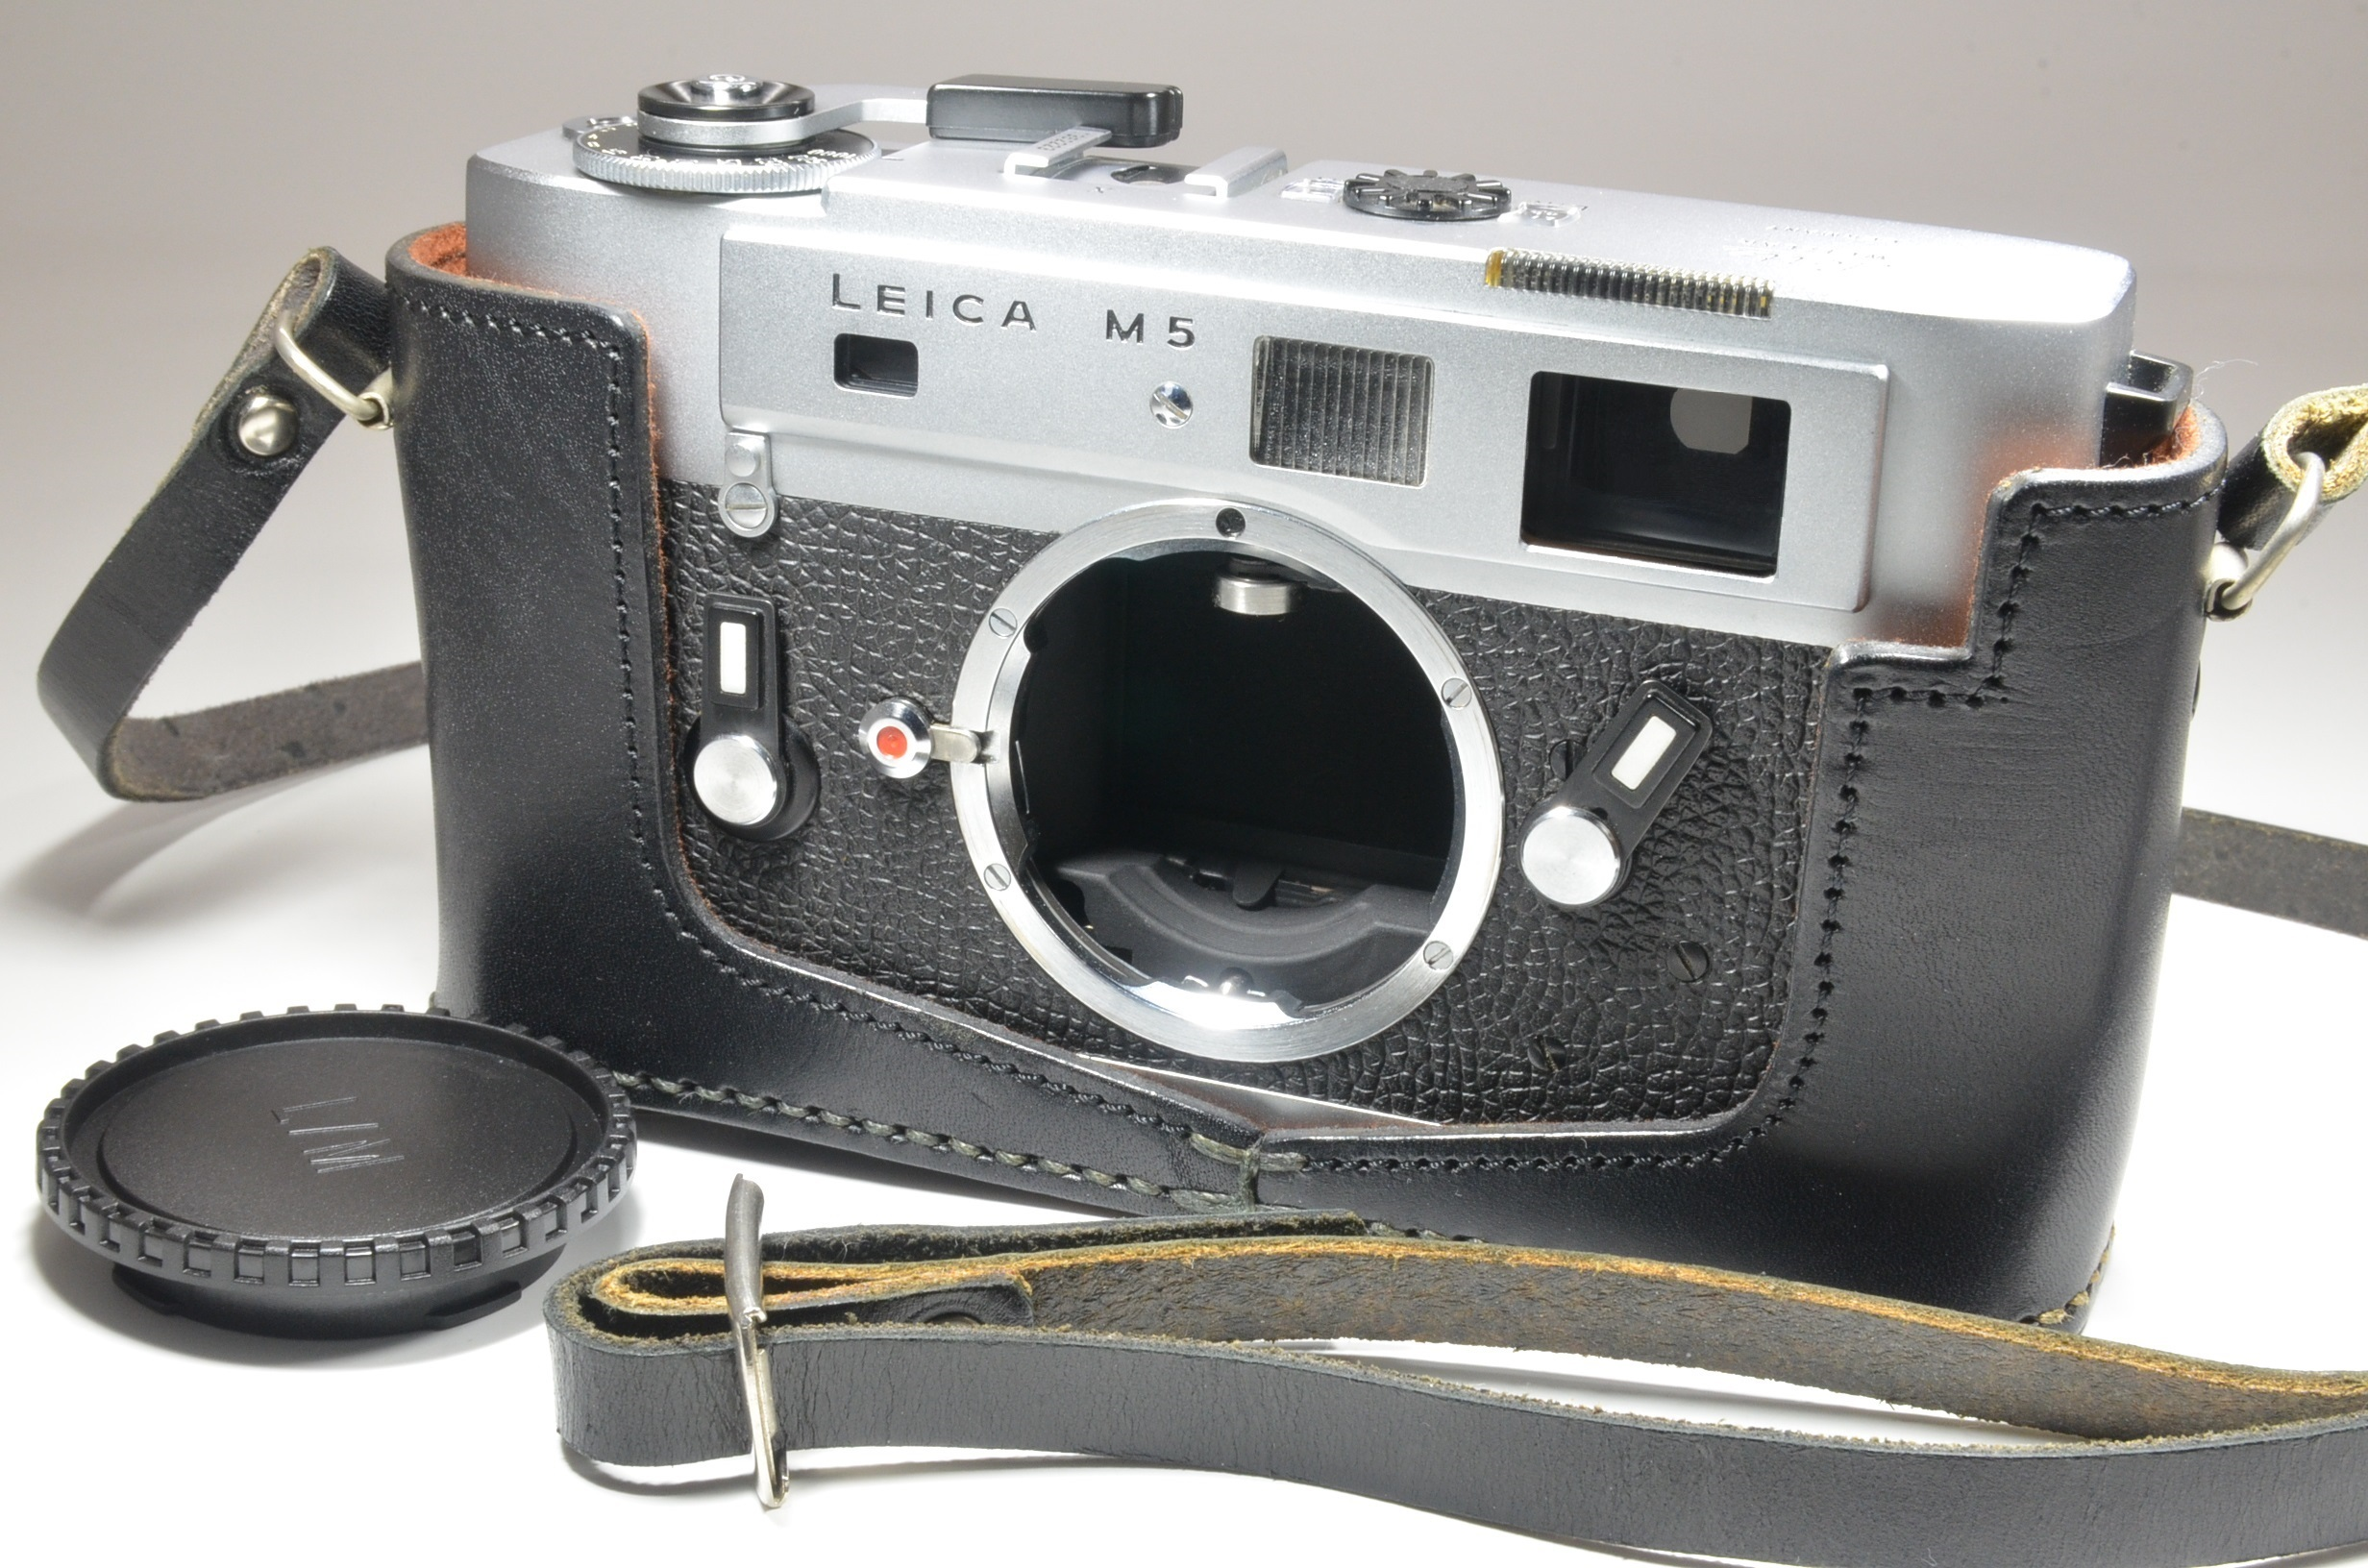 leica m5 chrome 3 lug year 1973 rangefinder camera with half case